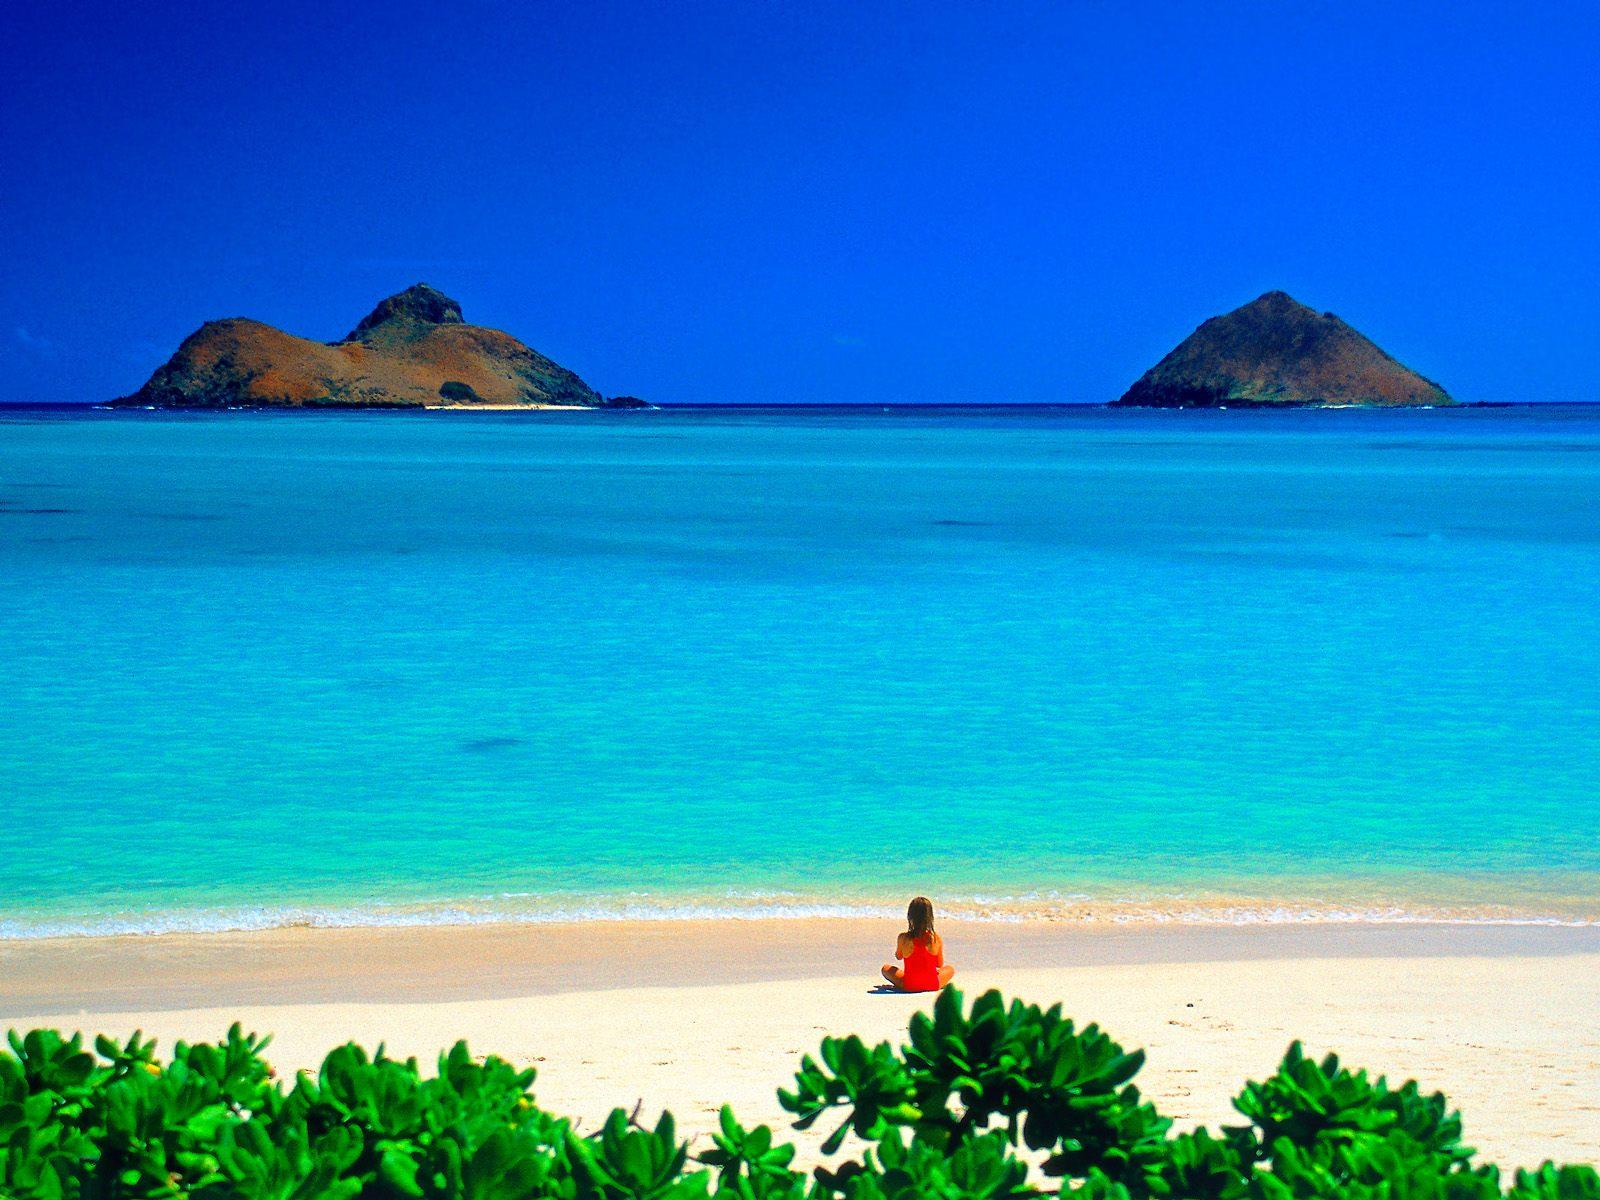 Hawaii beach sunset wallpapers: Oahu Hawaii